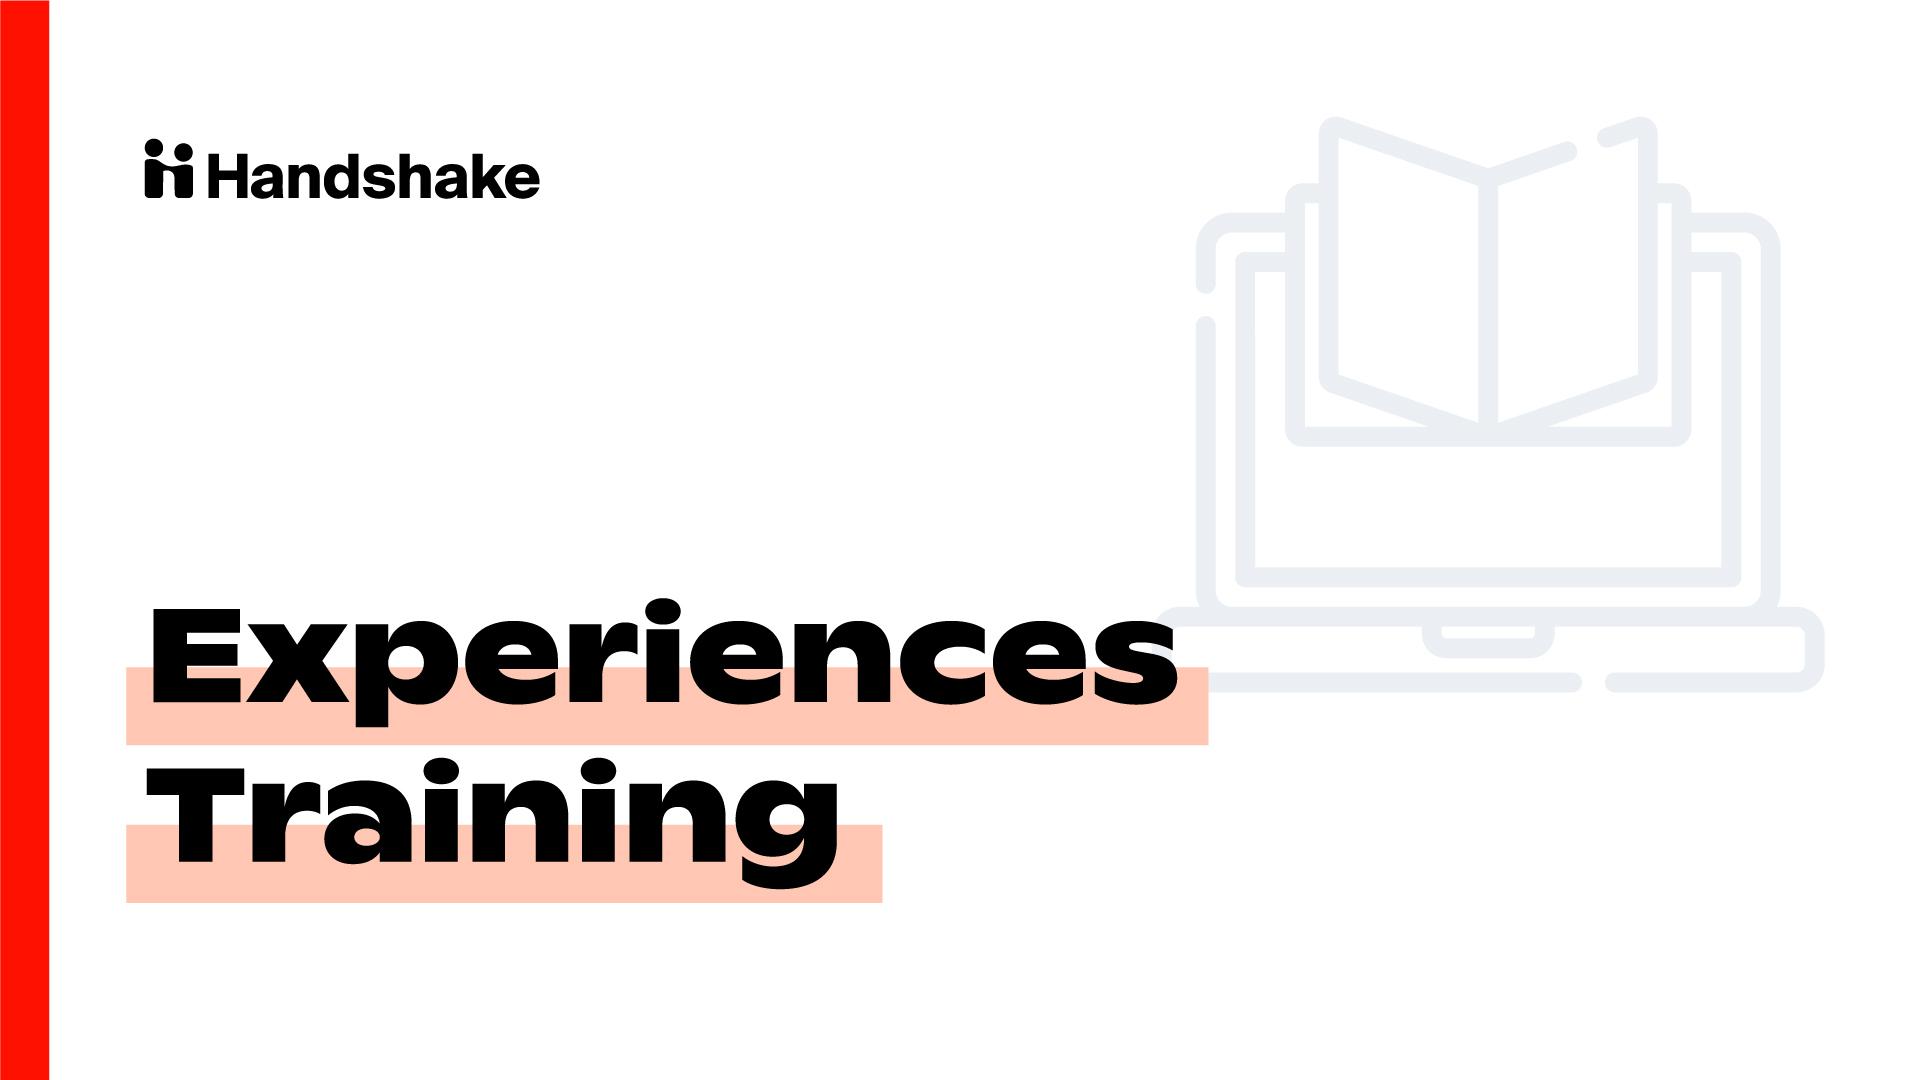 Experiences Training